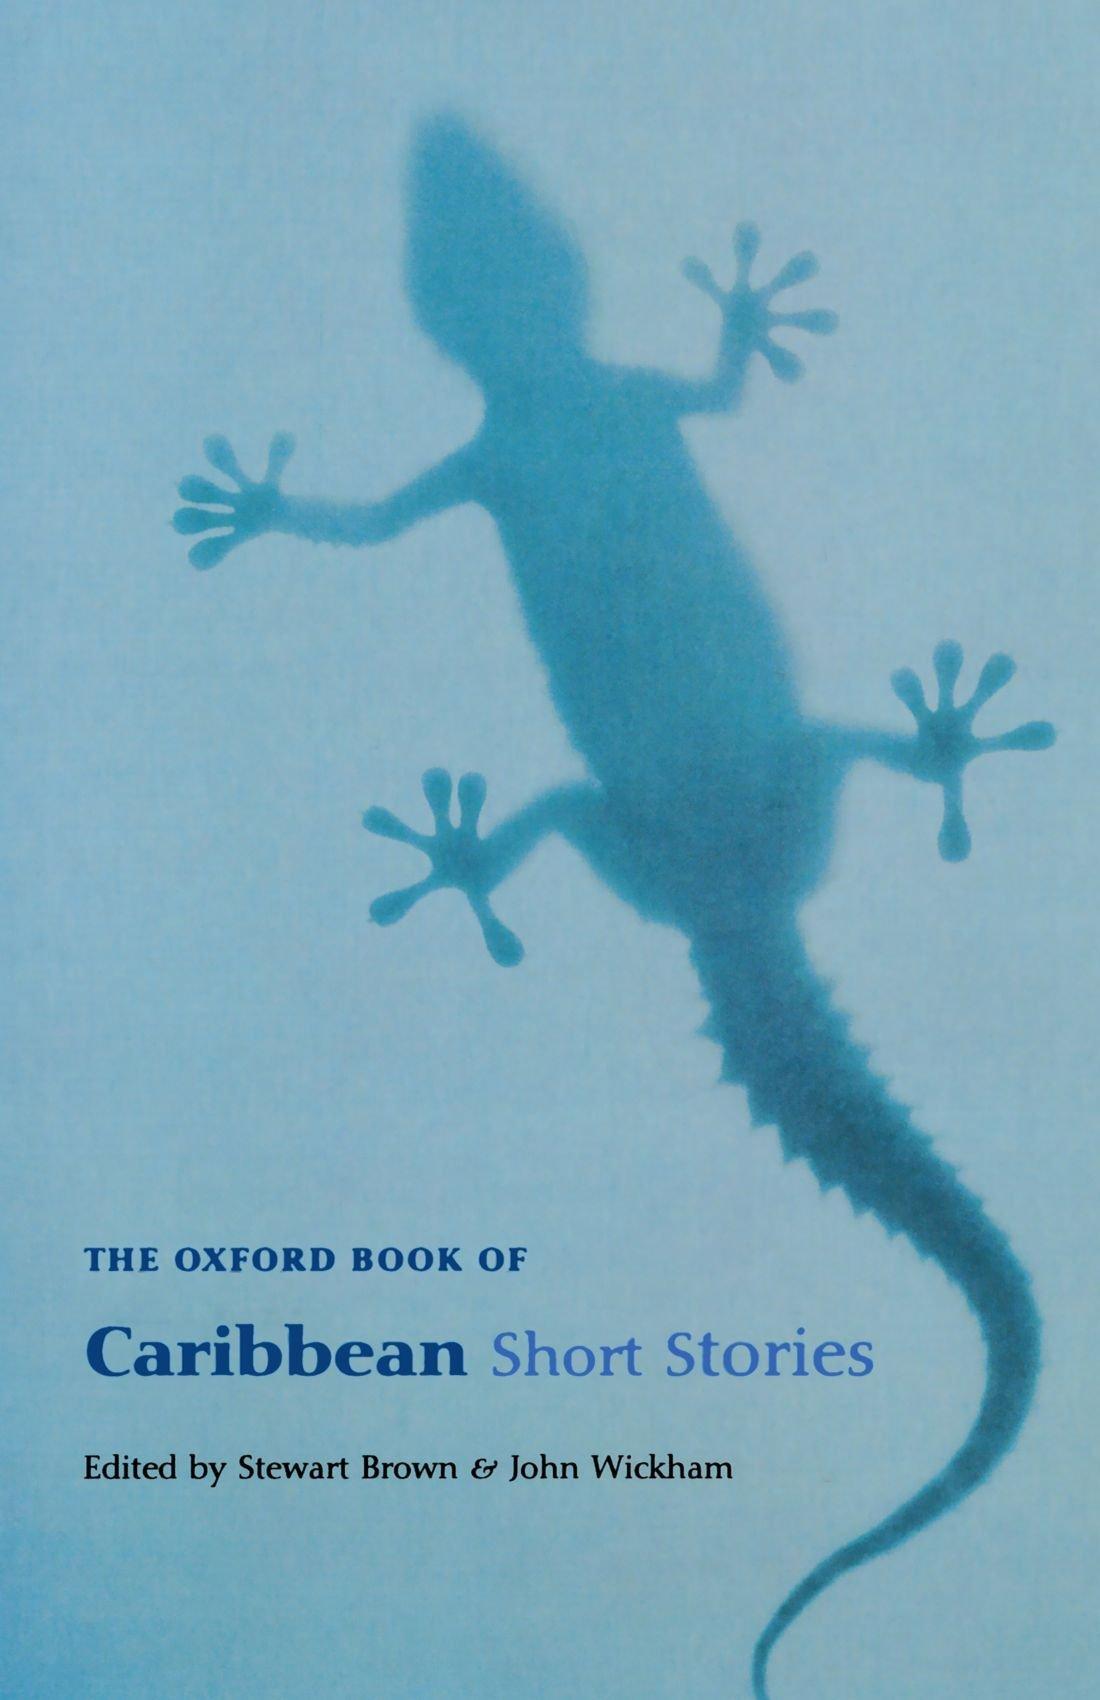 Amazon: The Oxford Book Of Caribbean Short Stories: Reissue (oxford  Books Of Prose) (9780192802293): Stewart Brown, John Wickham: Books